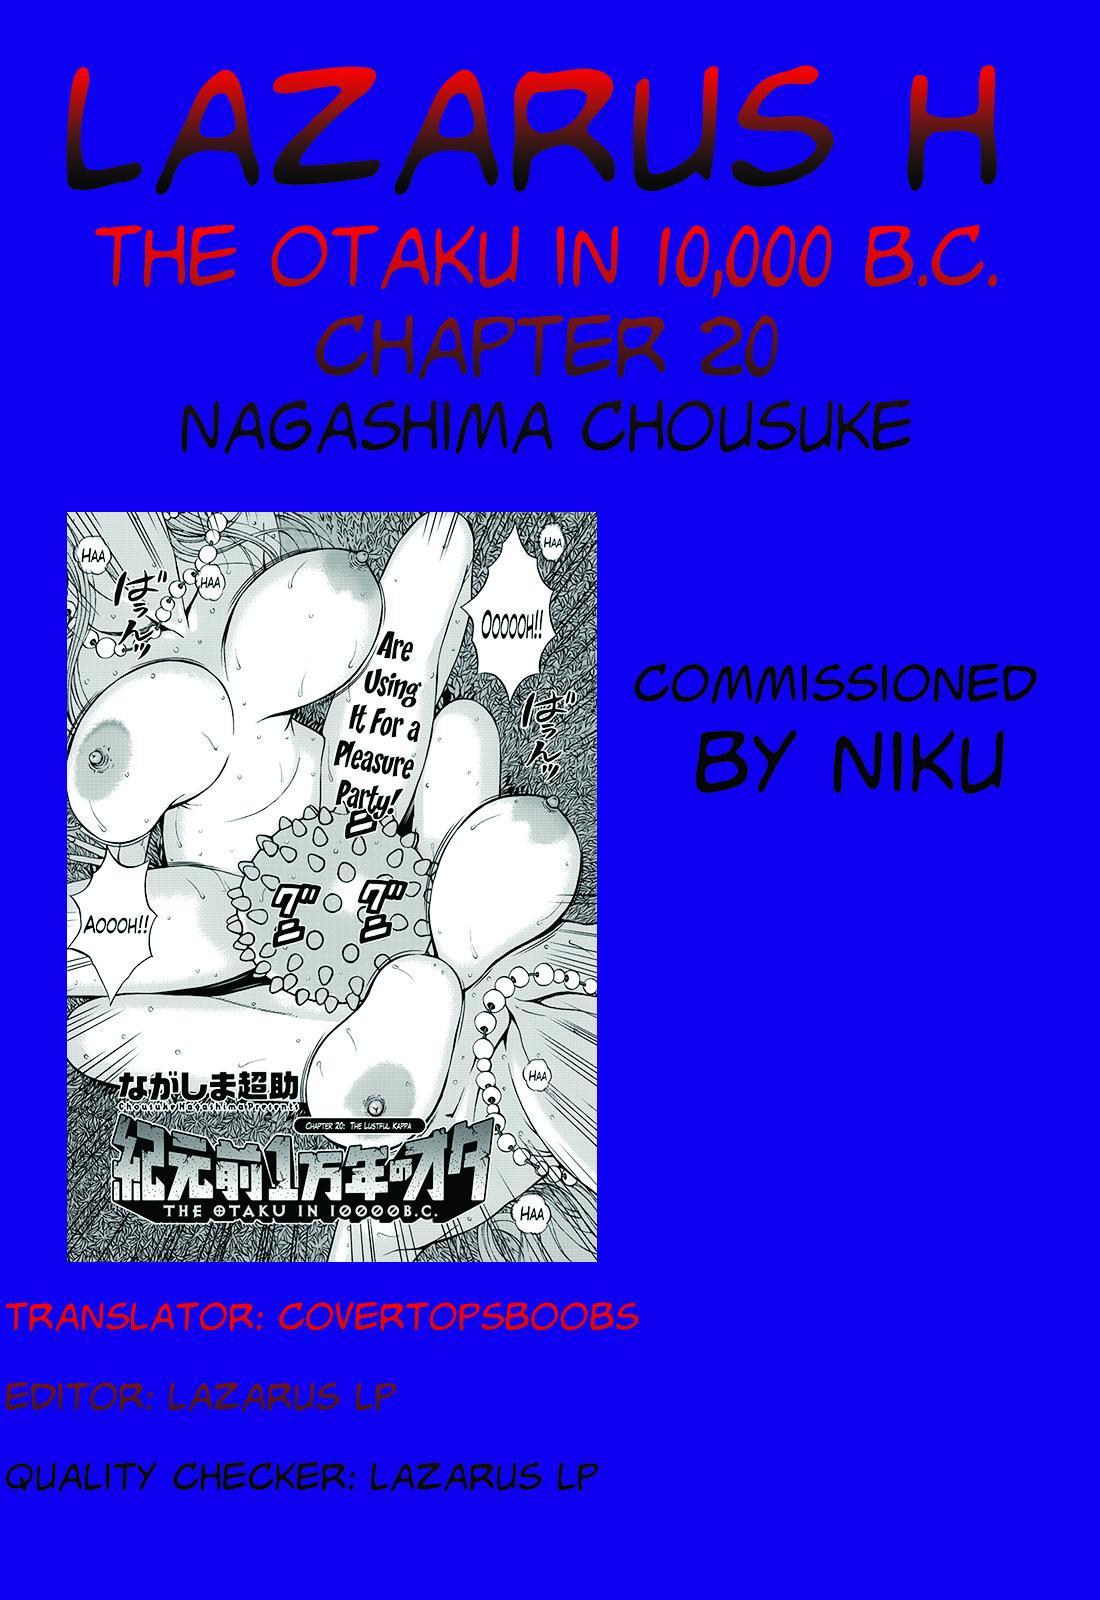 Kigenzen 10000 Nen no Ota | The Otaku in 10,000 B.C. 384